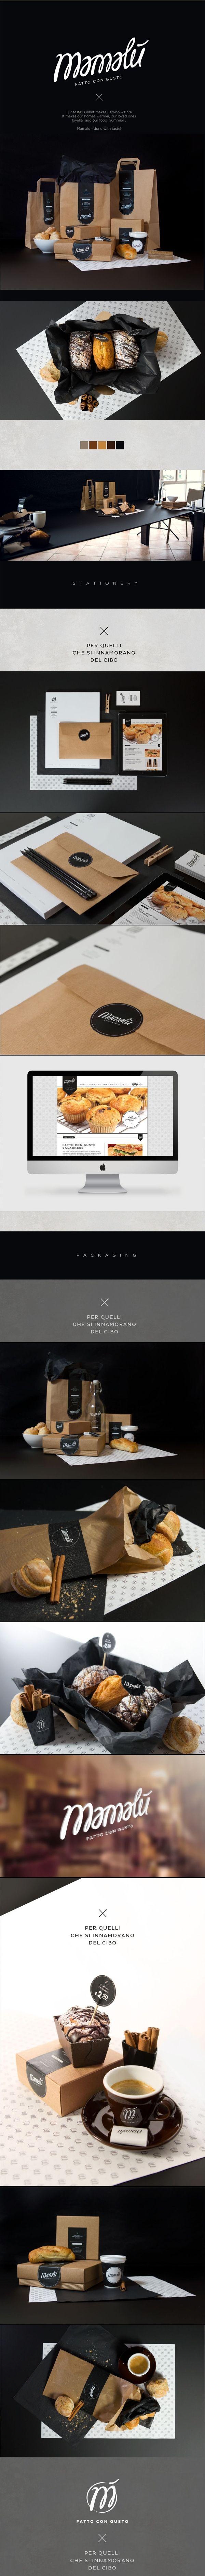 #branding #identity